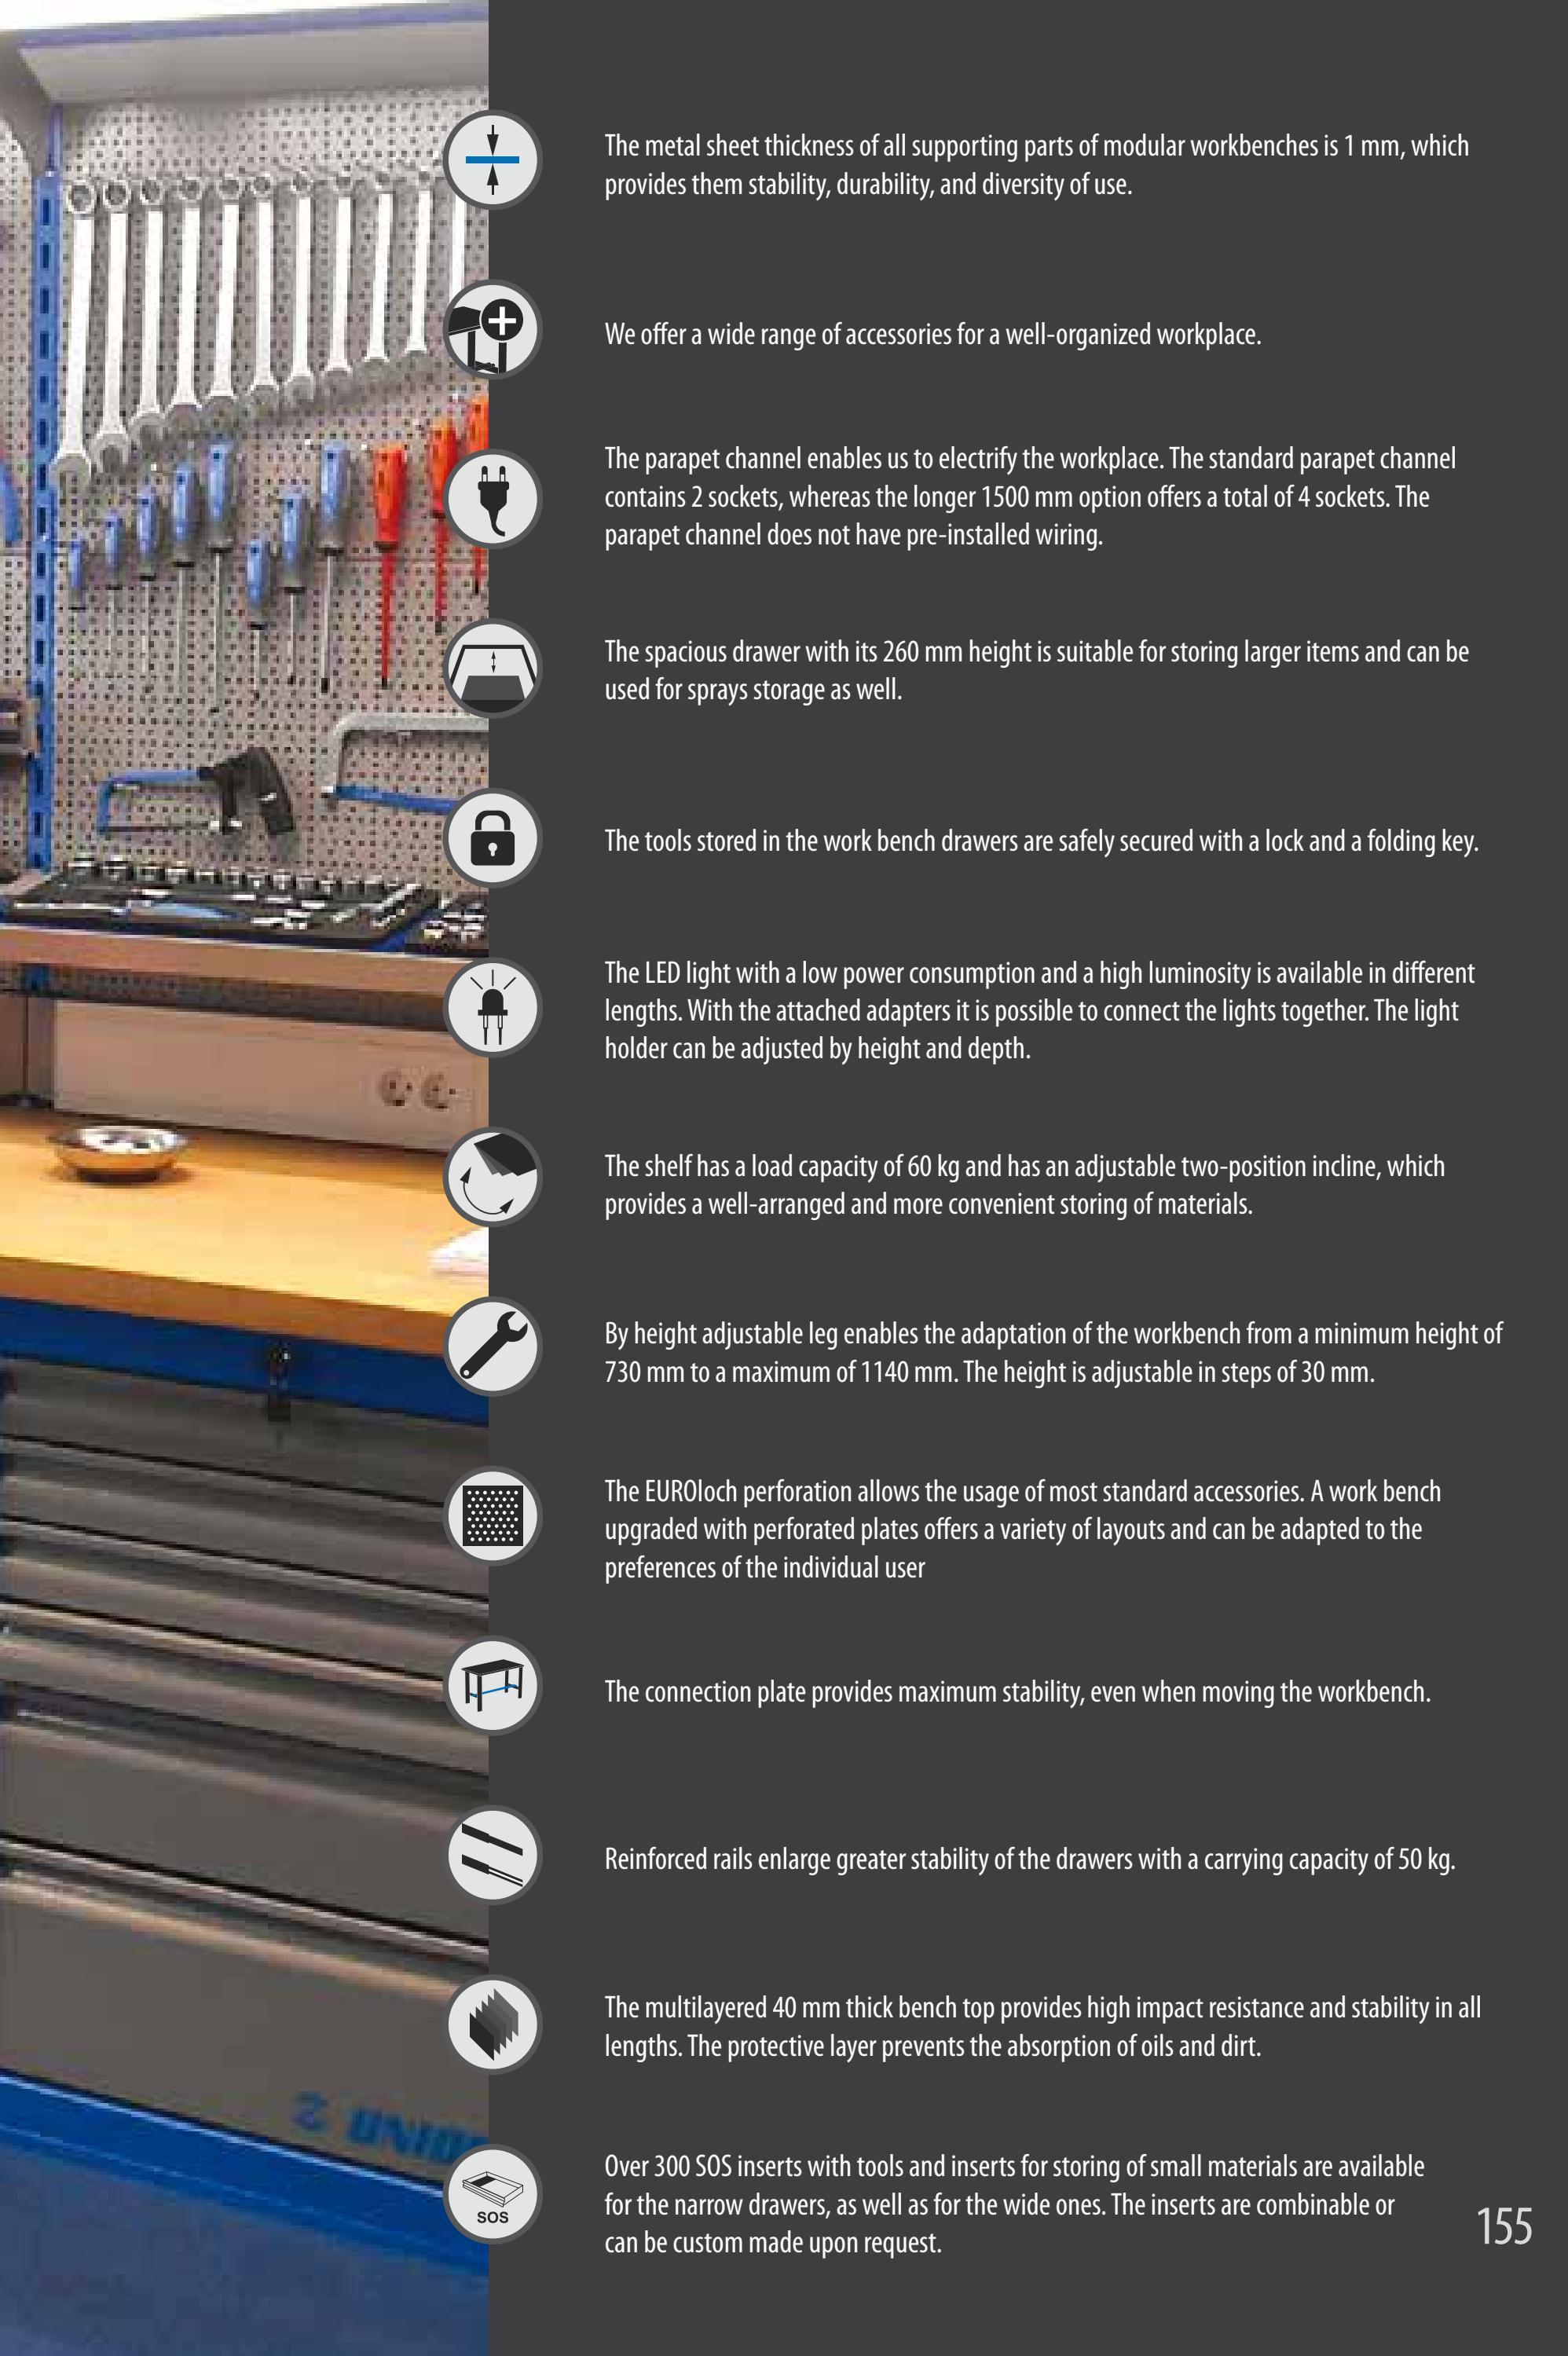 Sensational Unior Bike Tools Catalogue En 2018 By Erik Van Leeuwen Issuu Machost Co Dining Chair Design Ideas Machostcouk